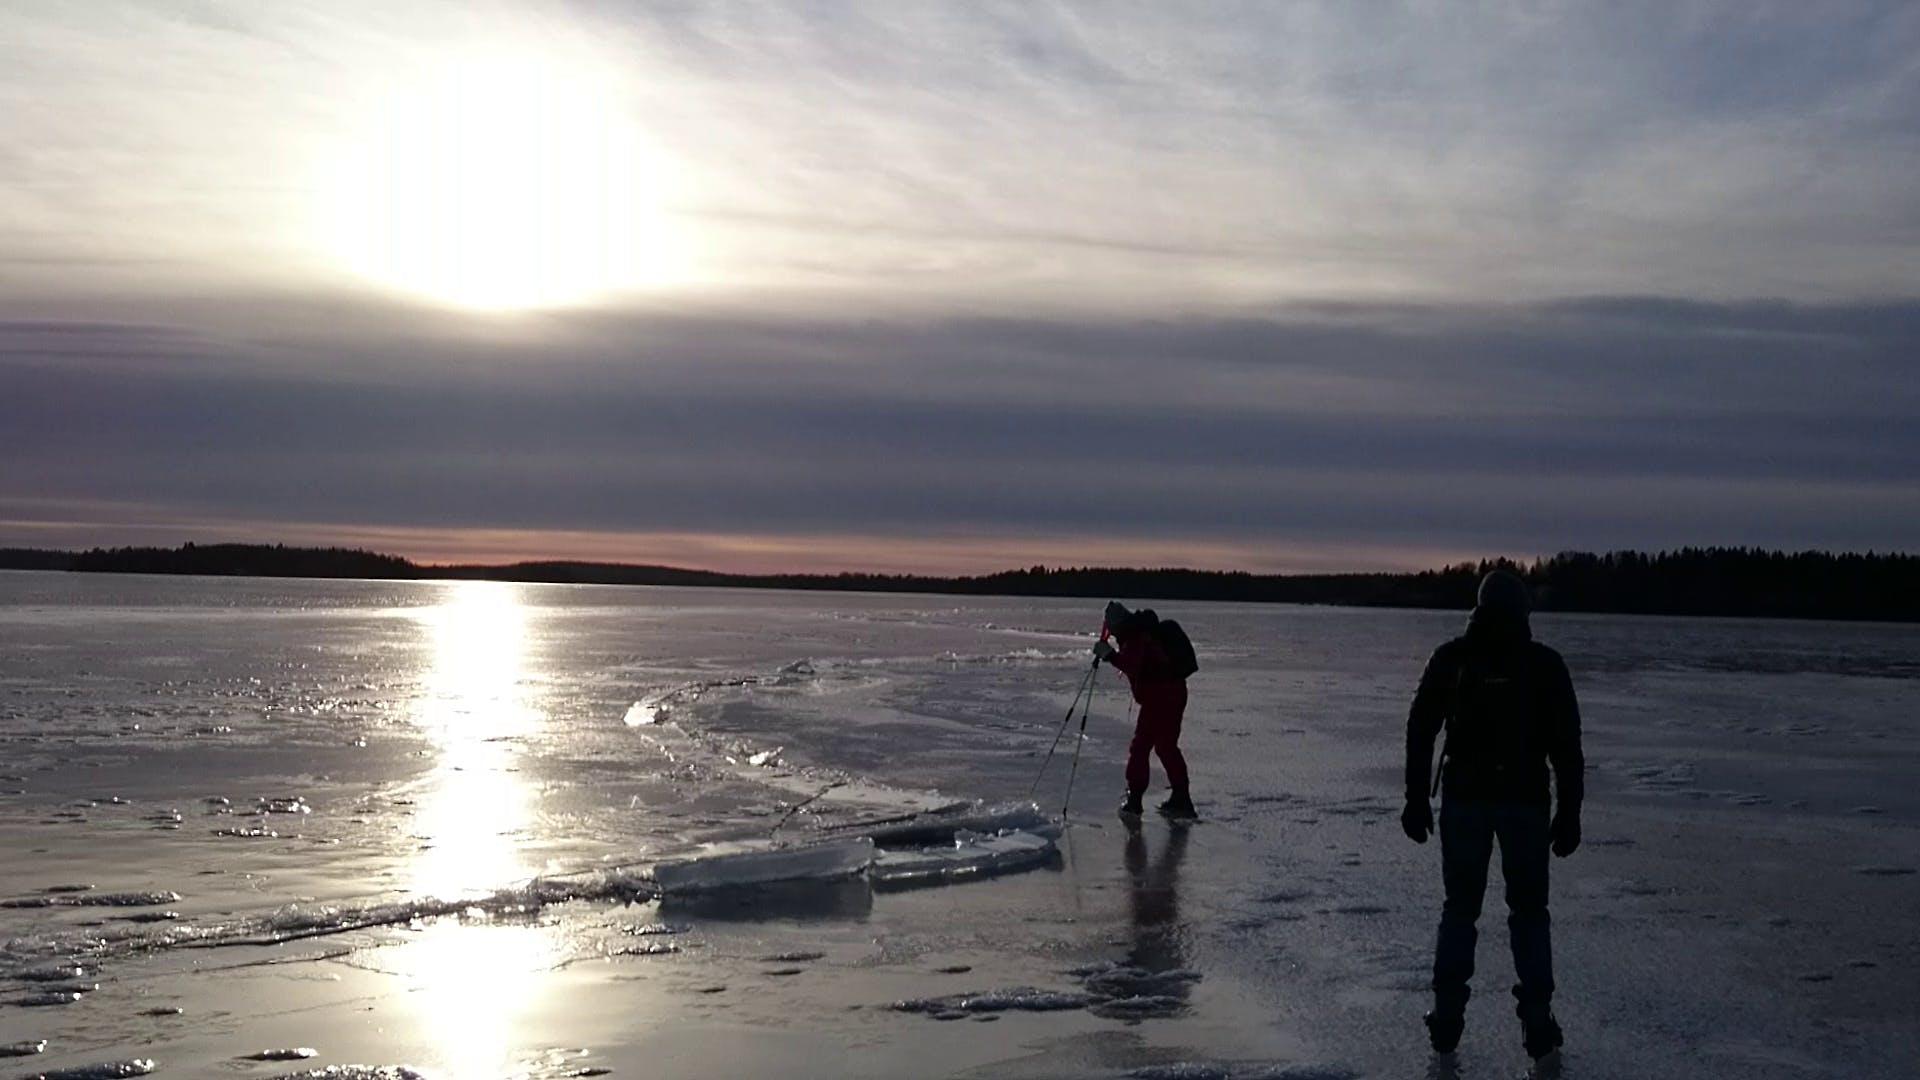 Free stock photo of ice, long-haul skates, winter